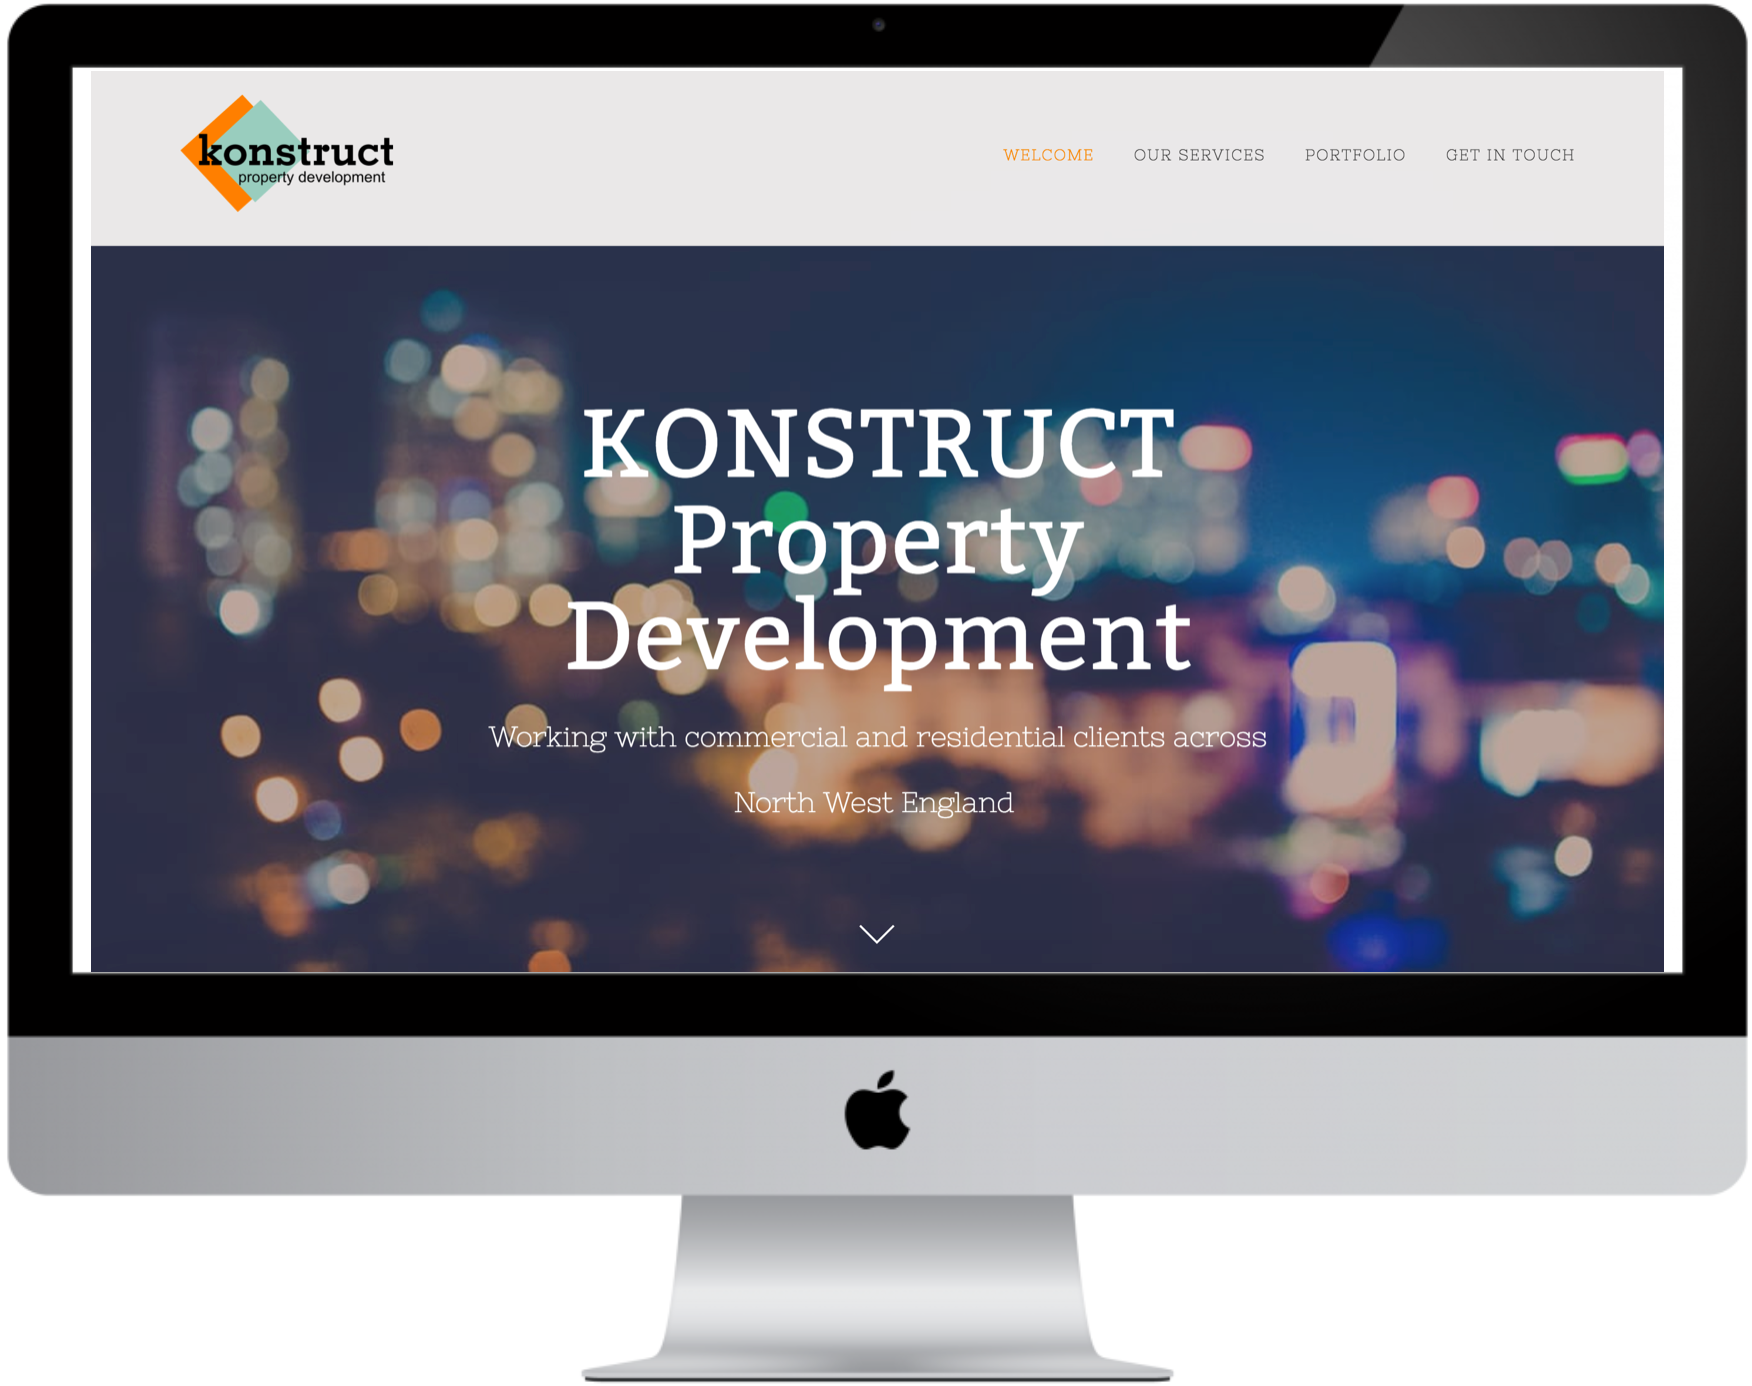 Konstruct Property Development